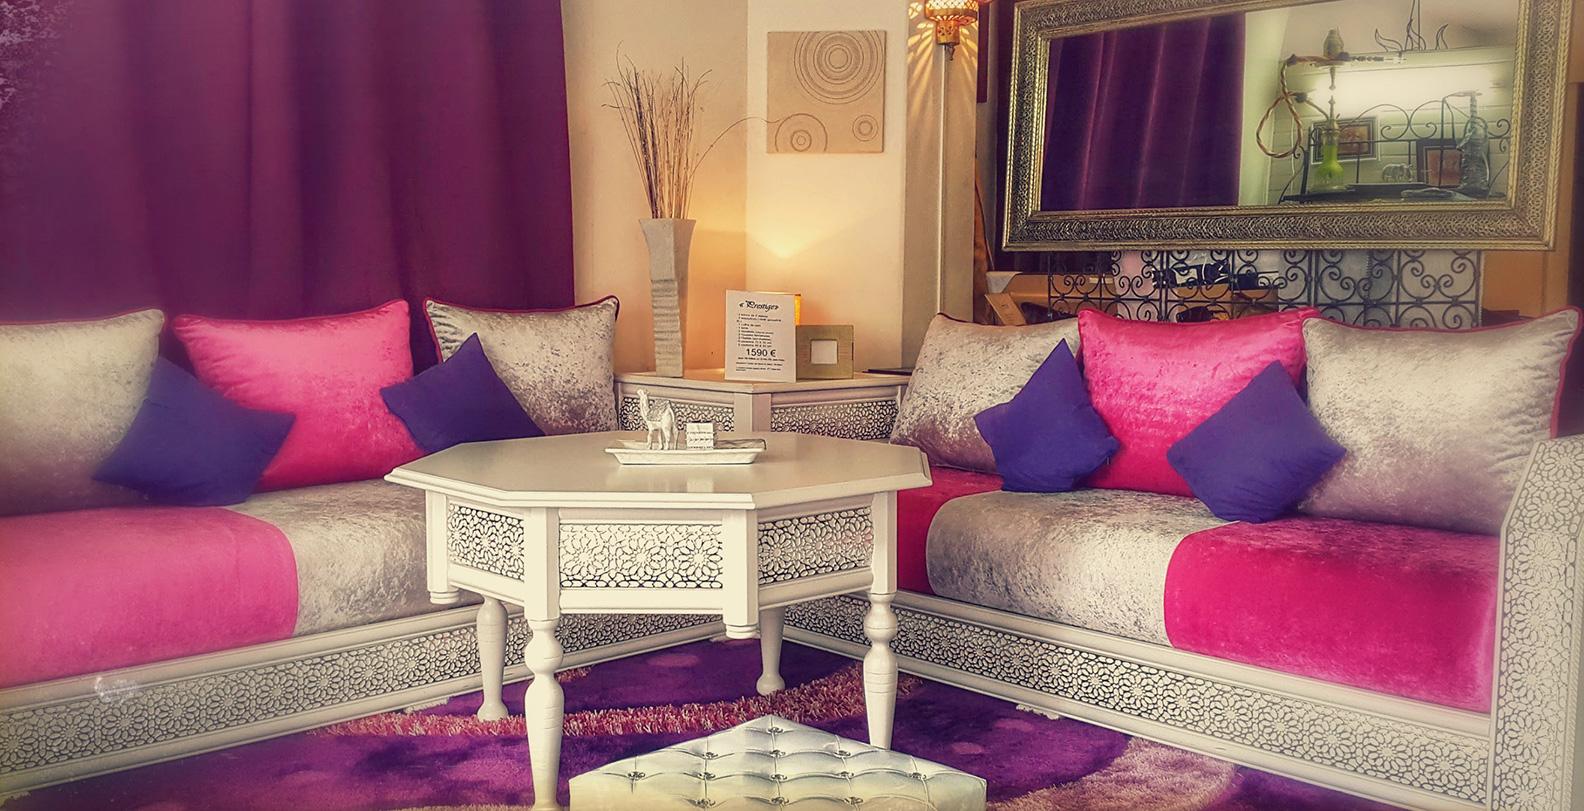 Salon Marocain Maroc Prix salon moderne 2019 et mobilier marocain – déco salon maroc